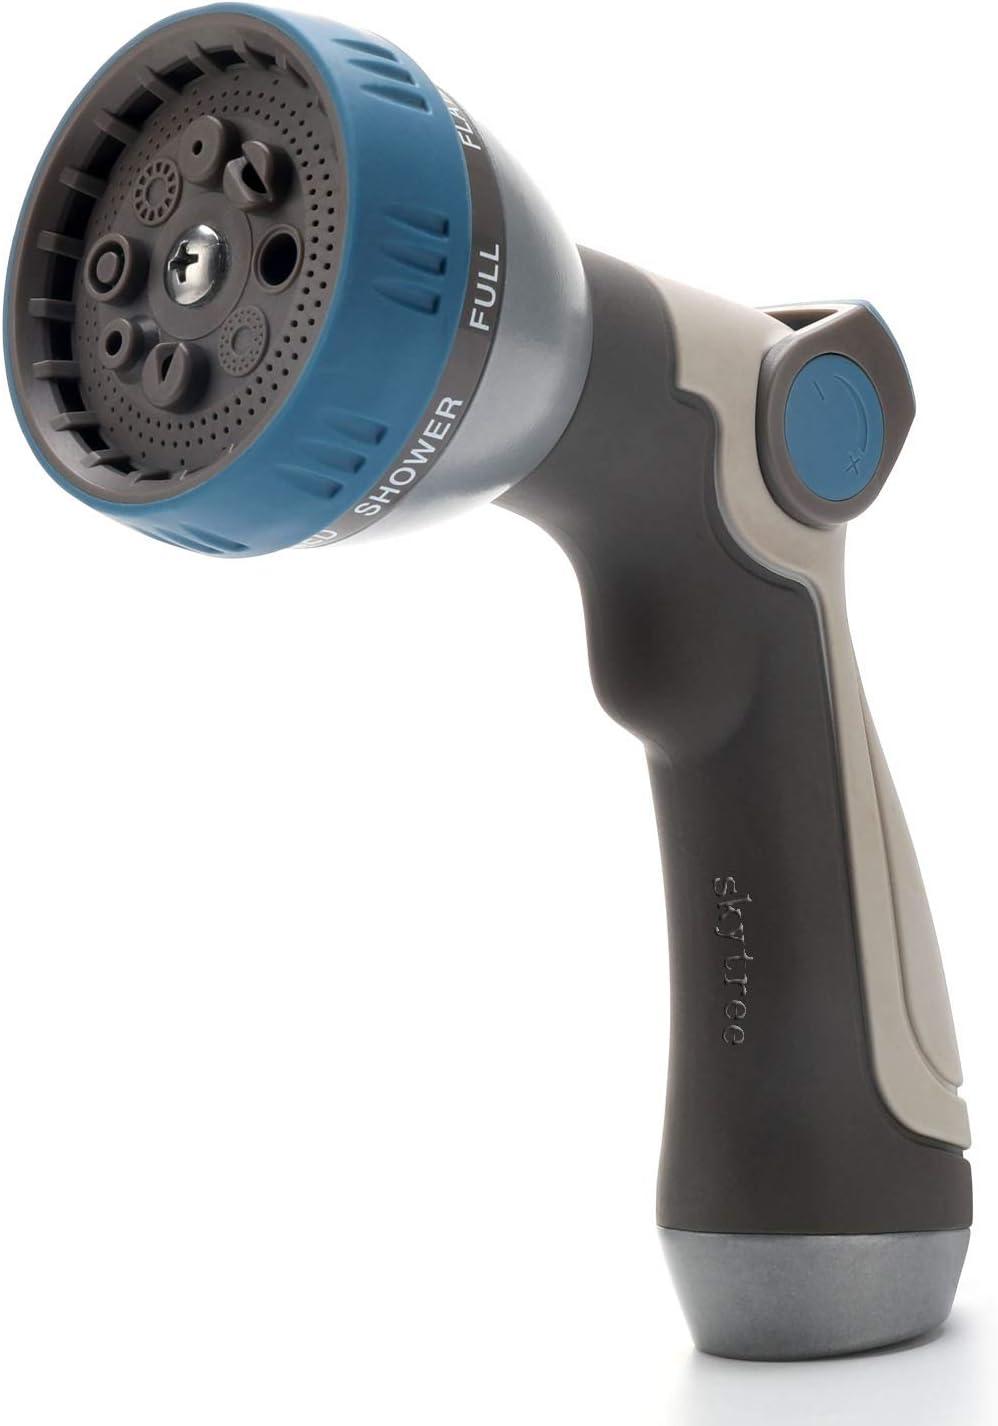 Hose Challenge the lowest price Nozzle Garden 100% quality warranty Metal Spray Patterns High Pressure 8